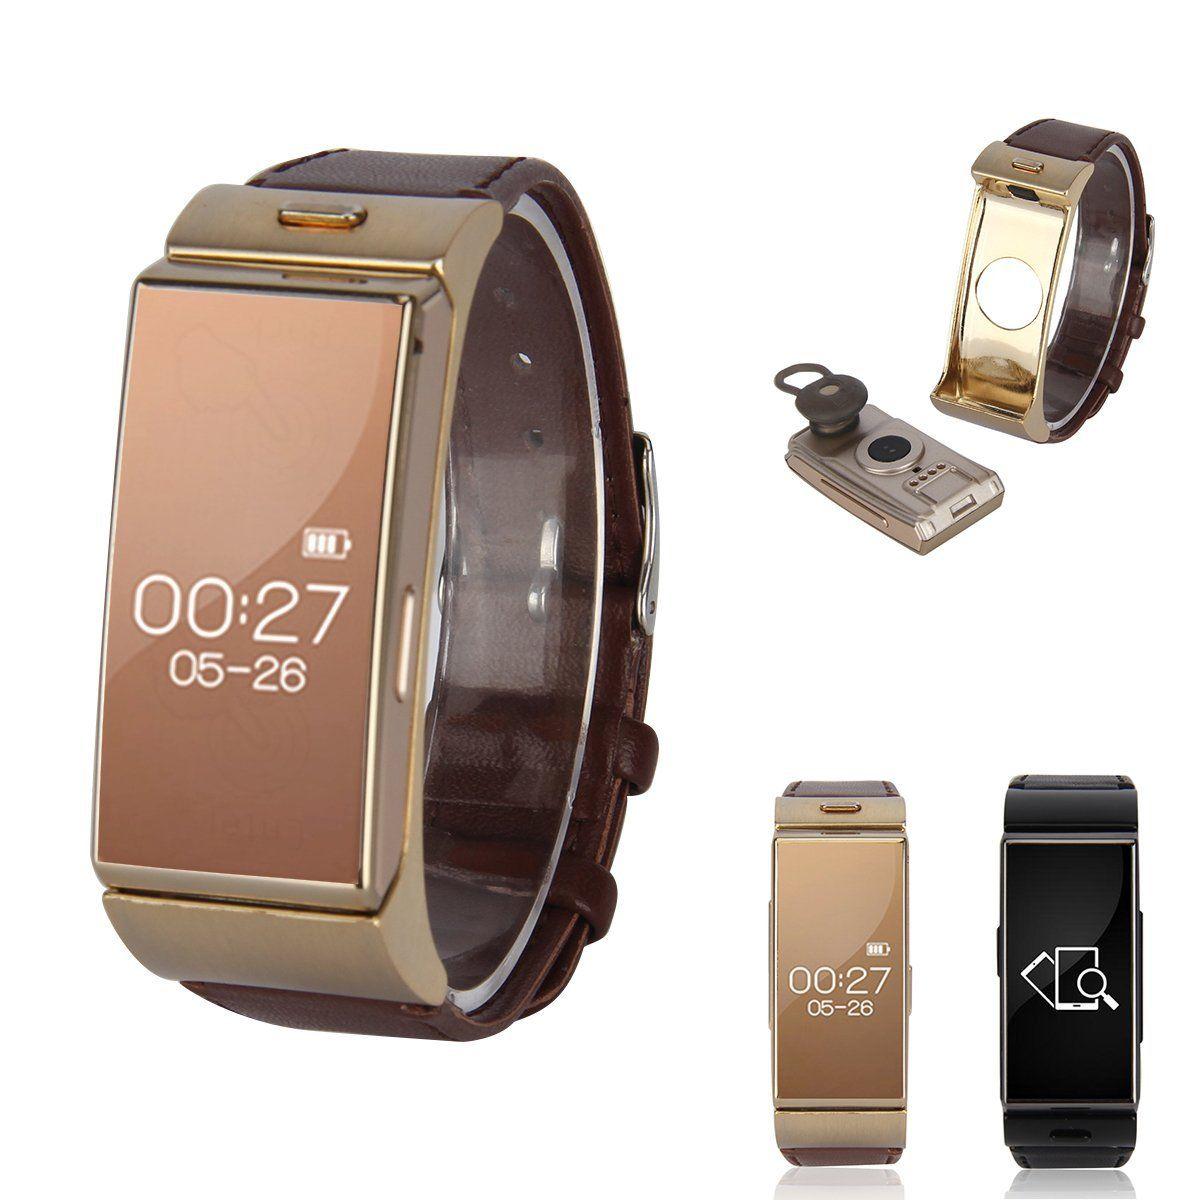 ФОТО New Vogue Bluetooth 4.0 Headset Earphone Heart Rate Sports Smart Wristband Watch Bracelet